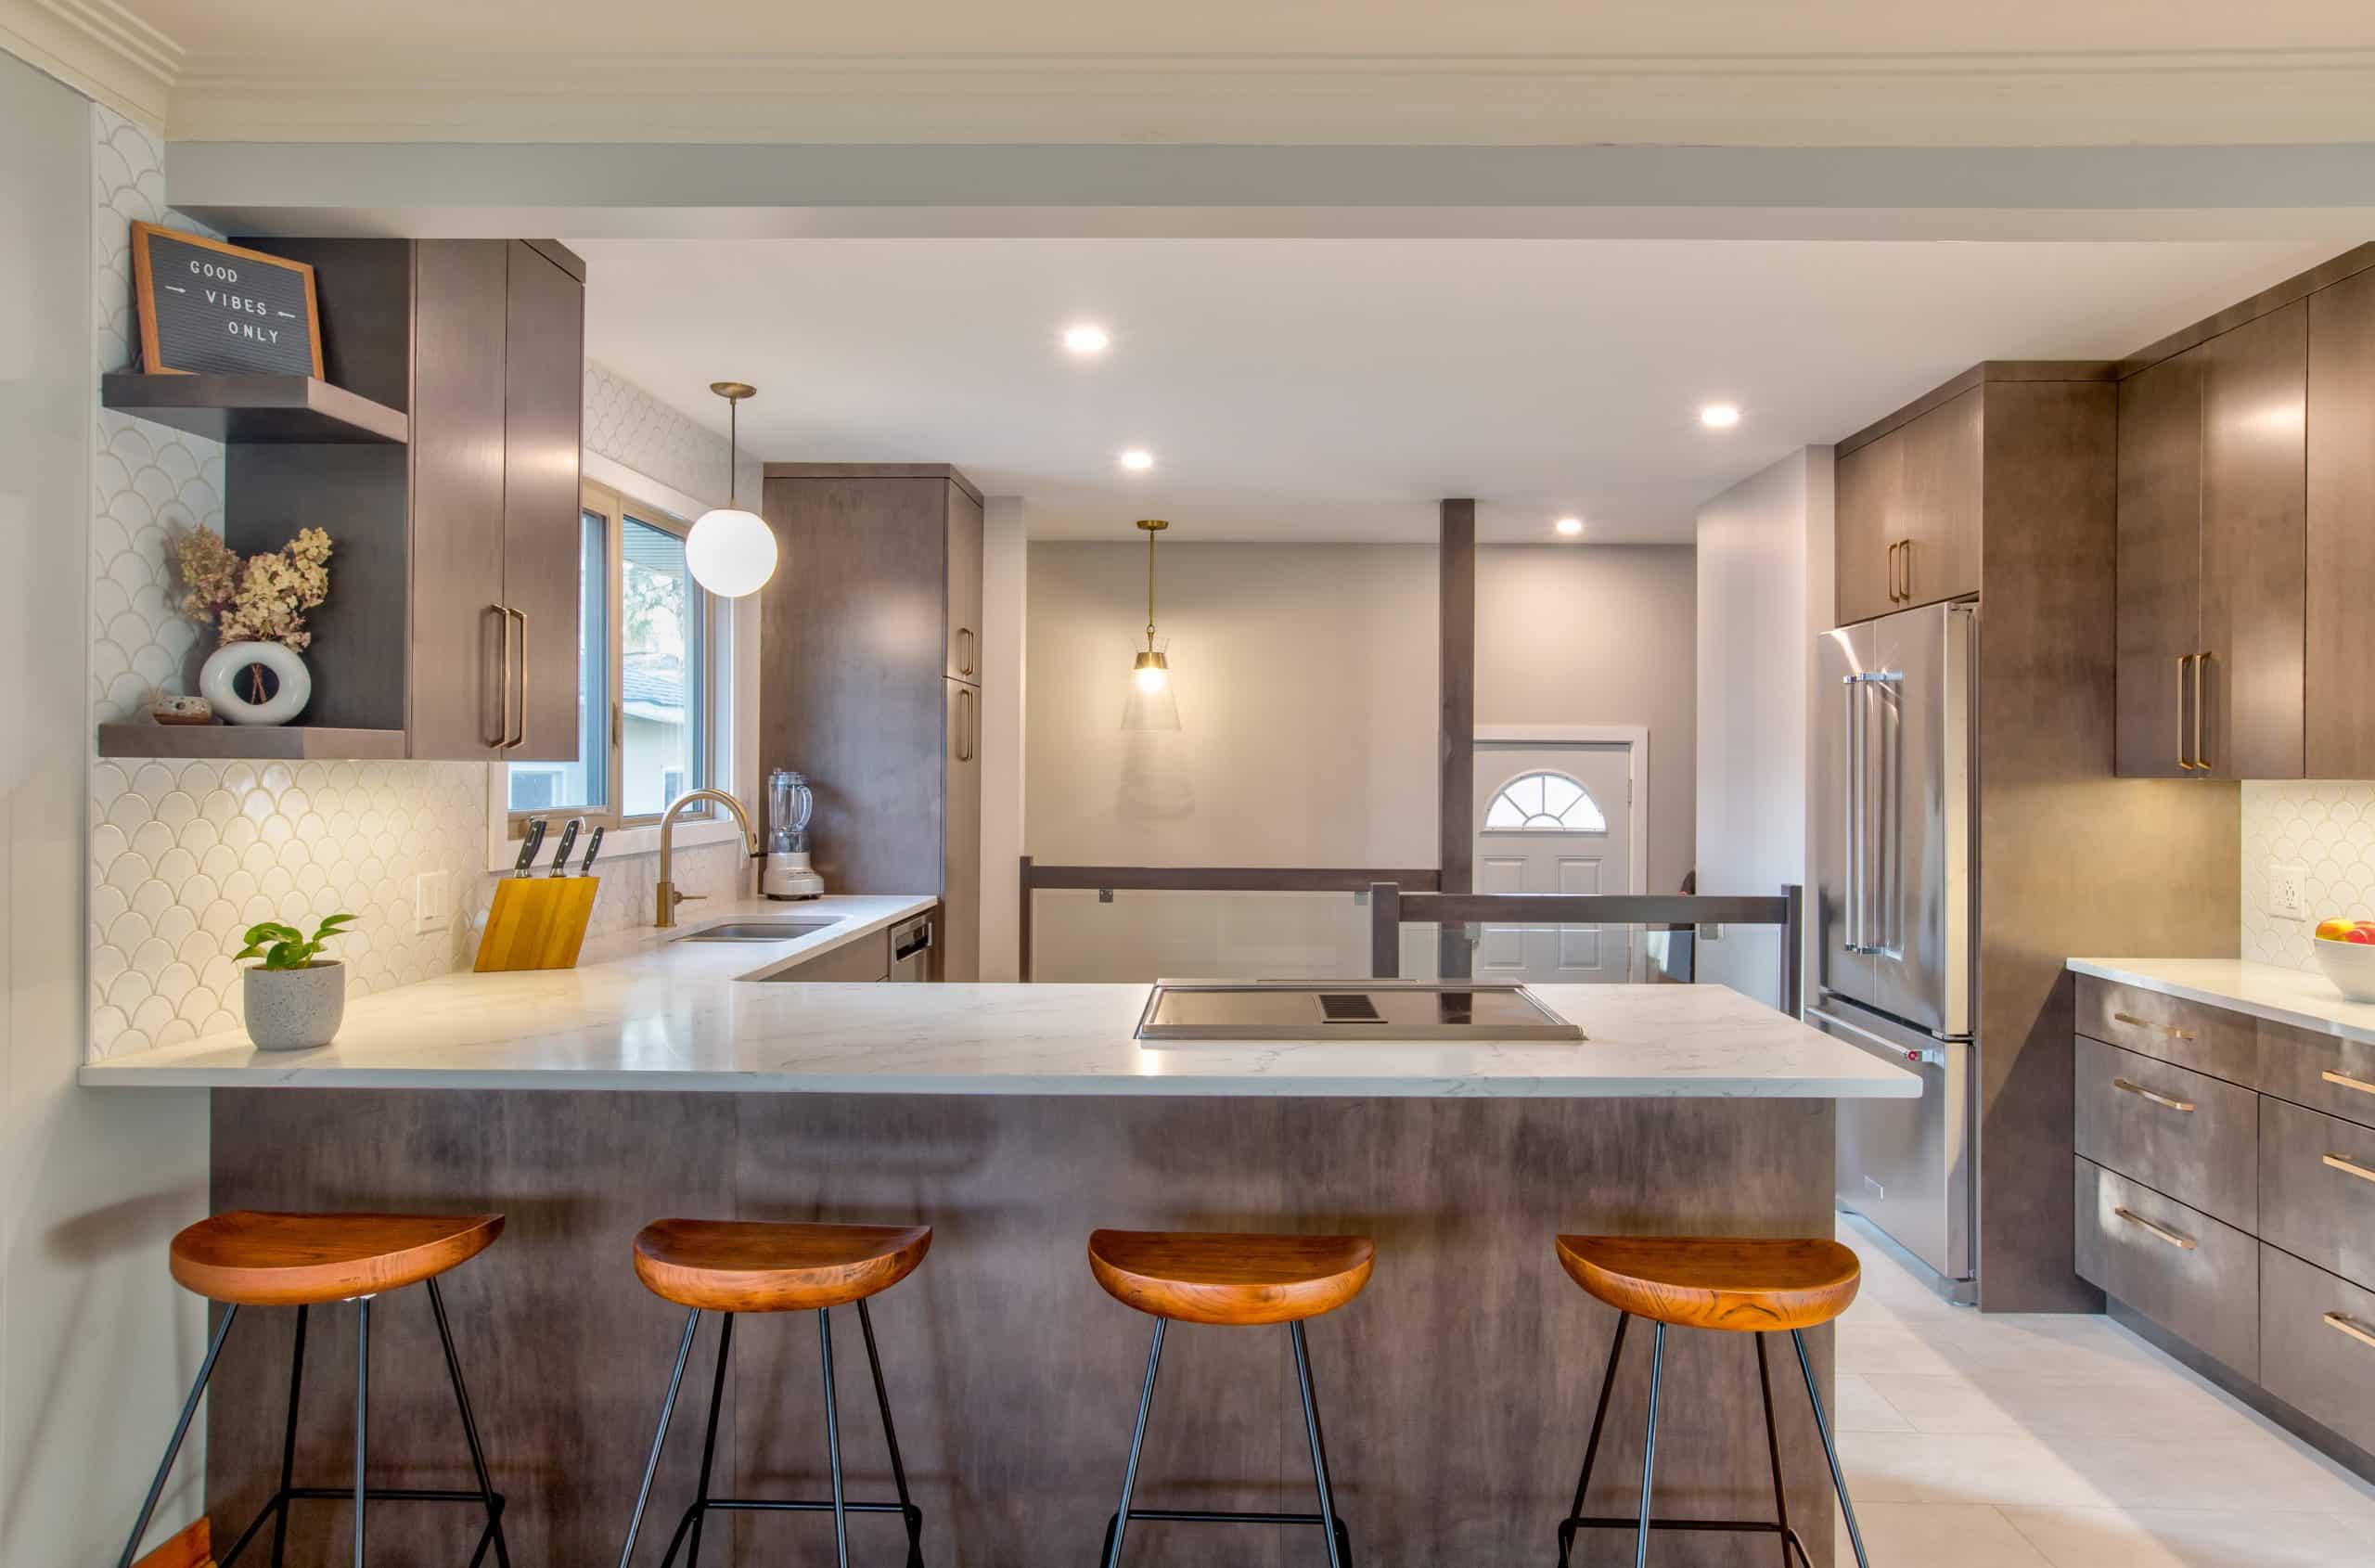 Willowdale Crescent - Hammerdown Construction - Kitchen Renovation Winnipeg